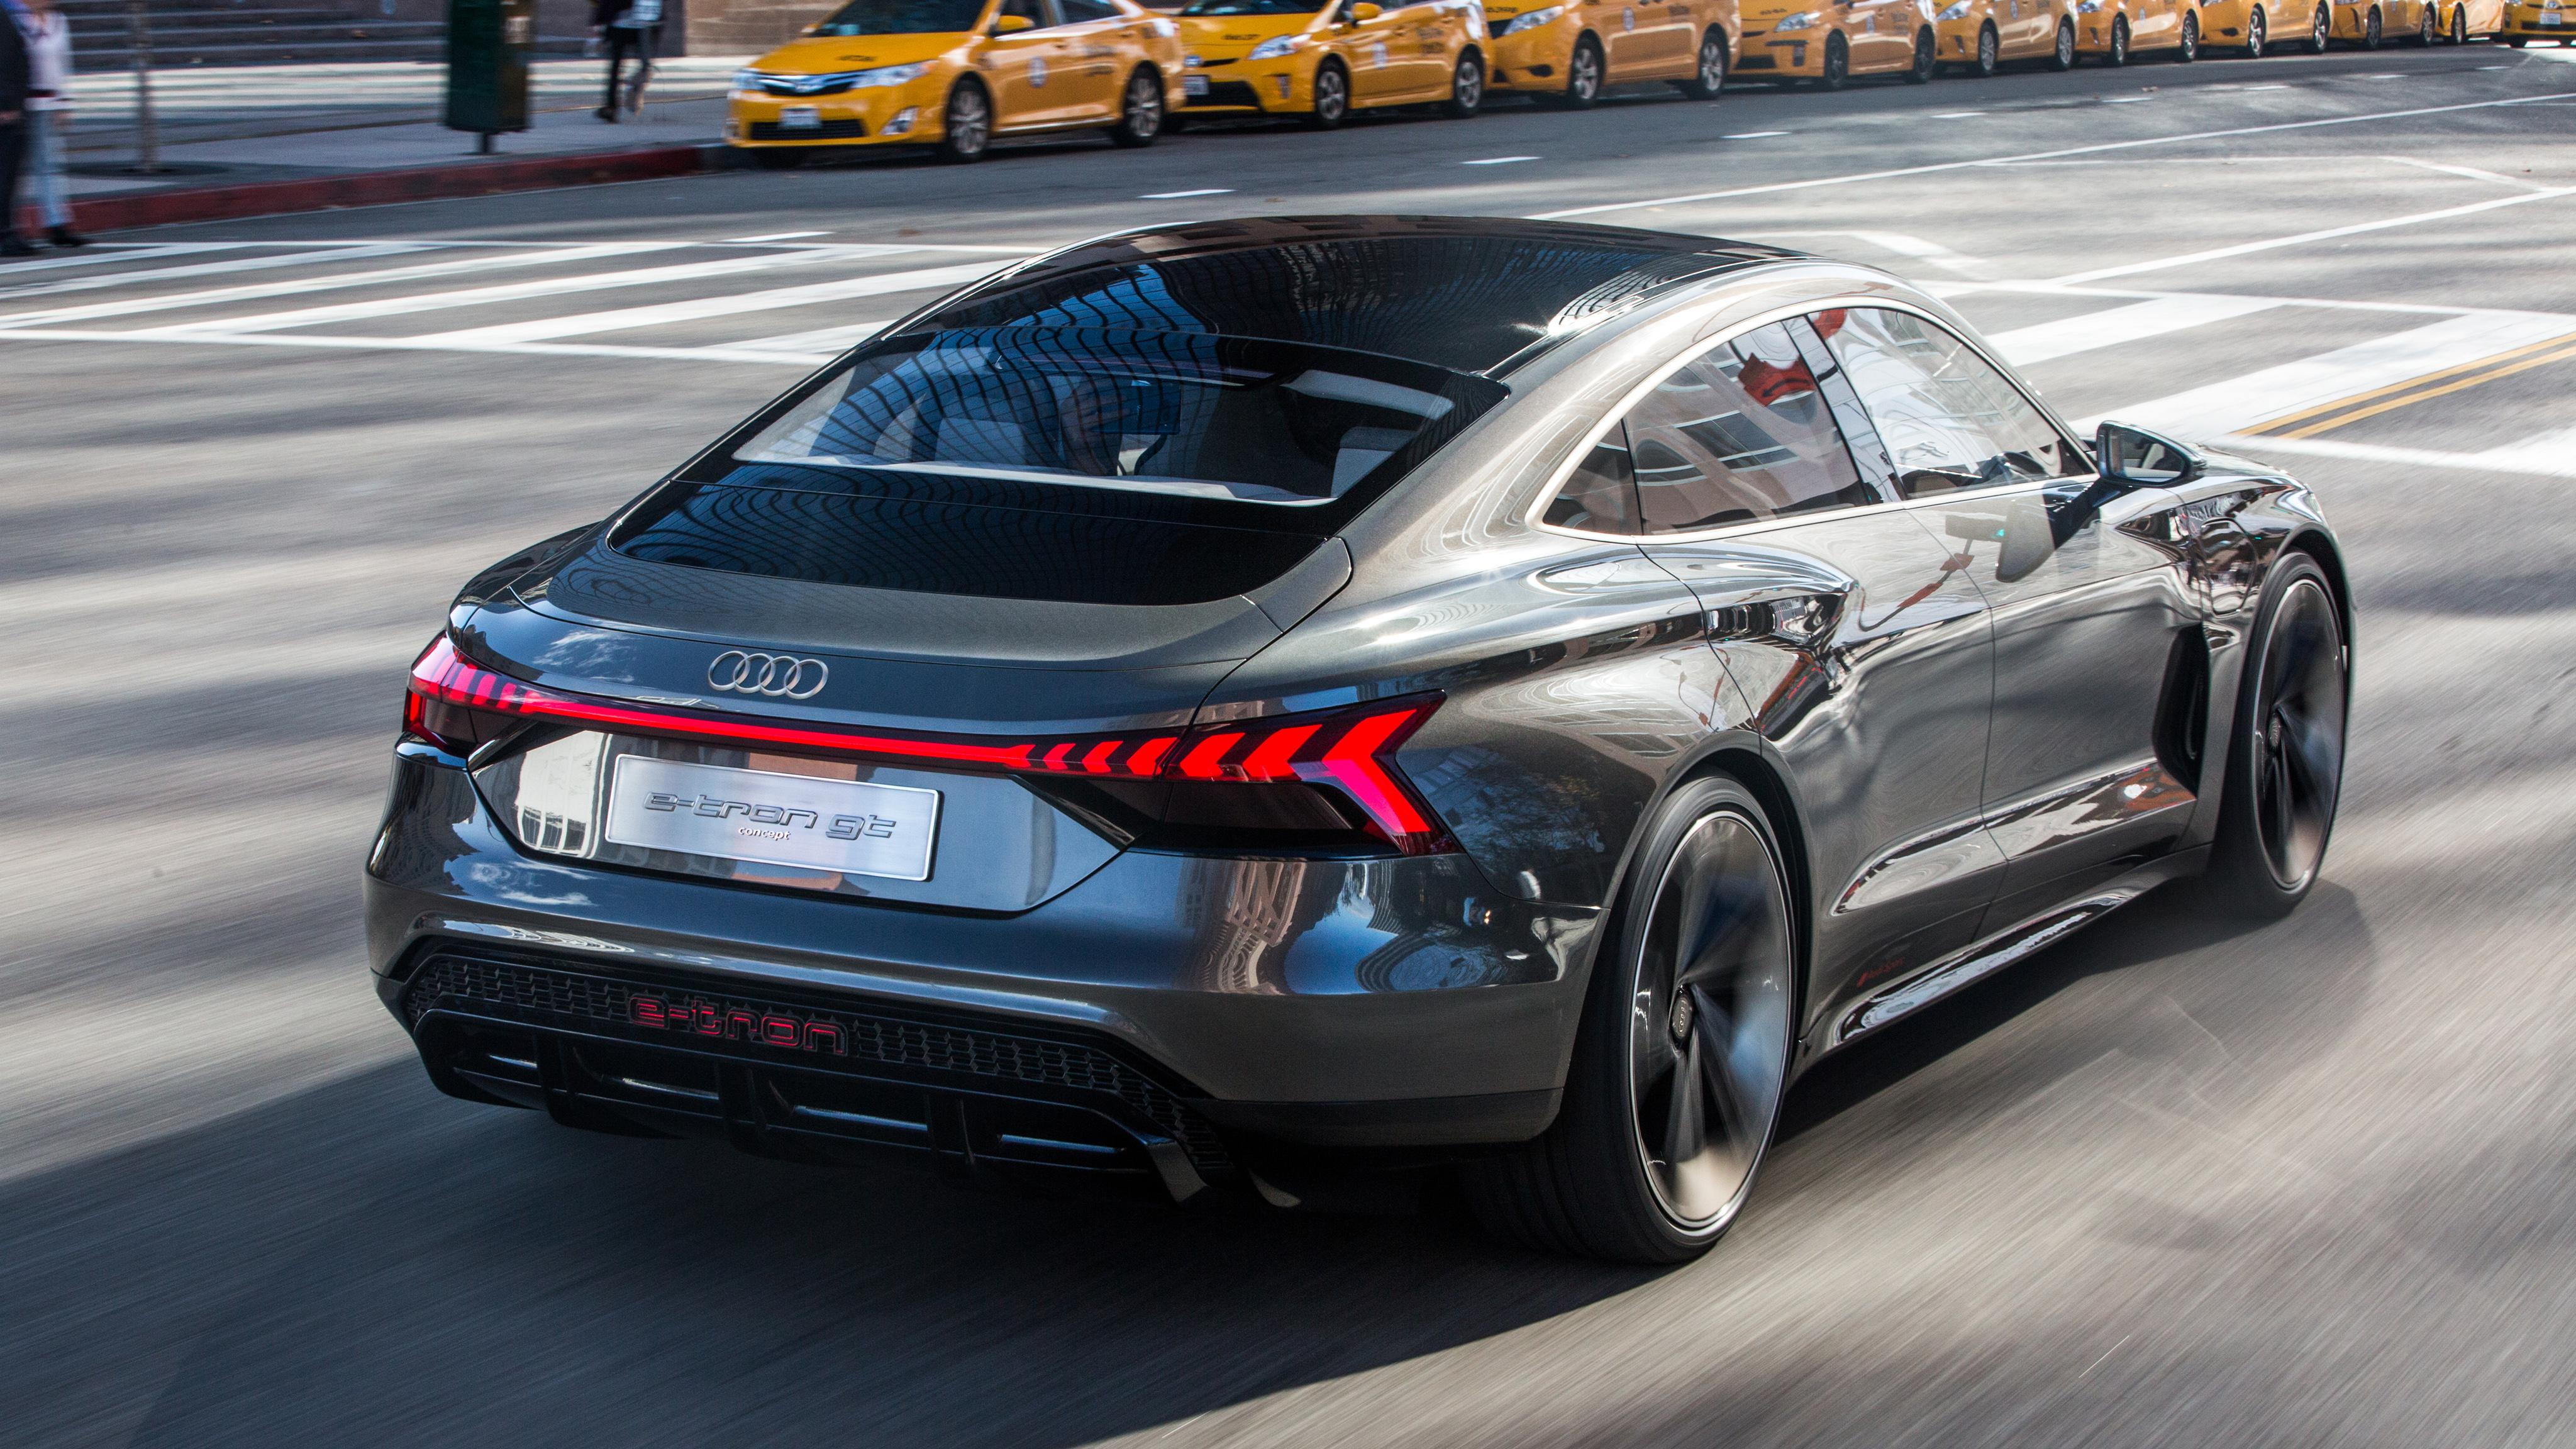 Audi e-tron GT Concept 2019 4K 2 Wallpaper   HD Car ...